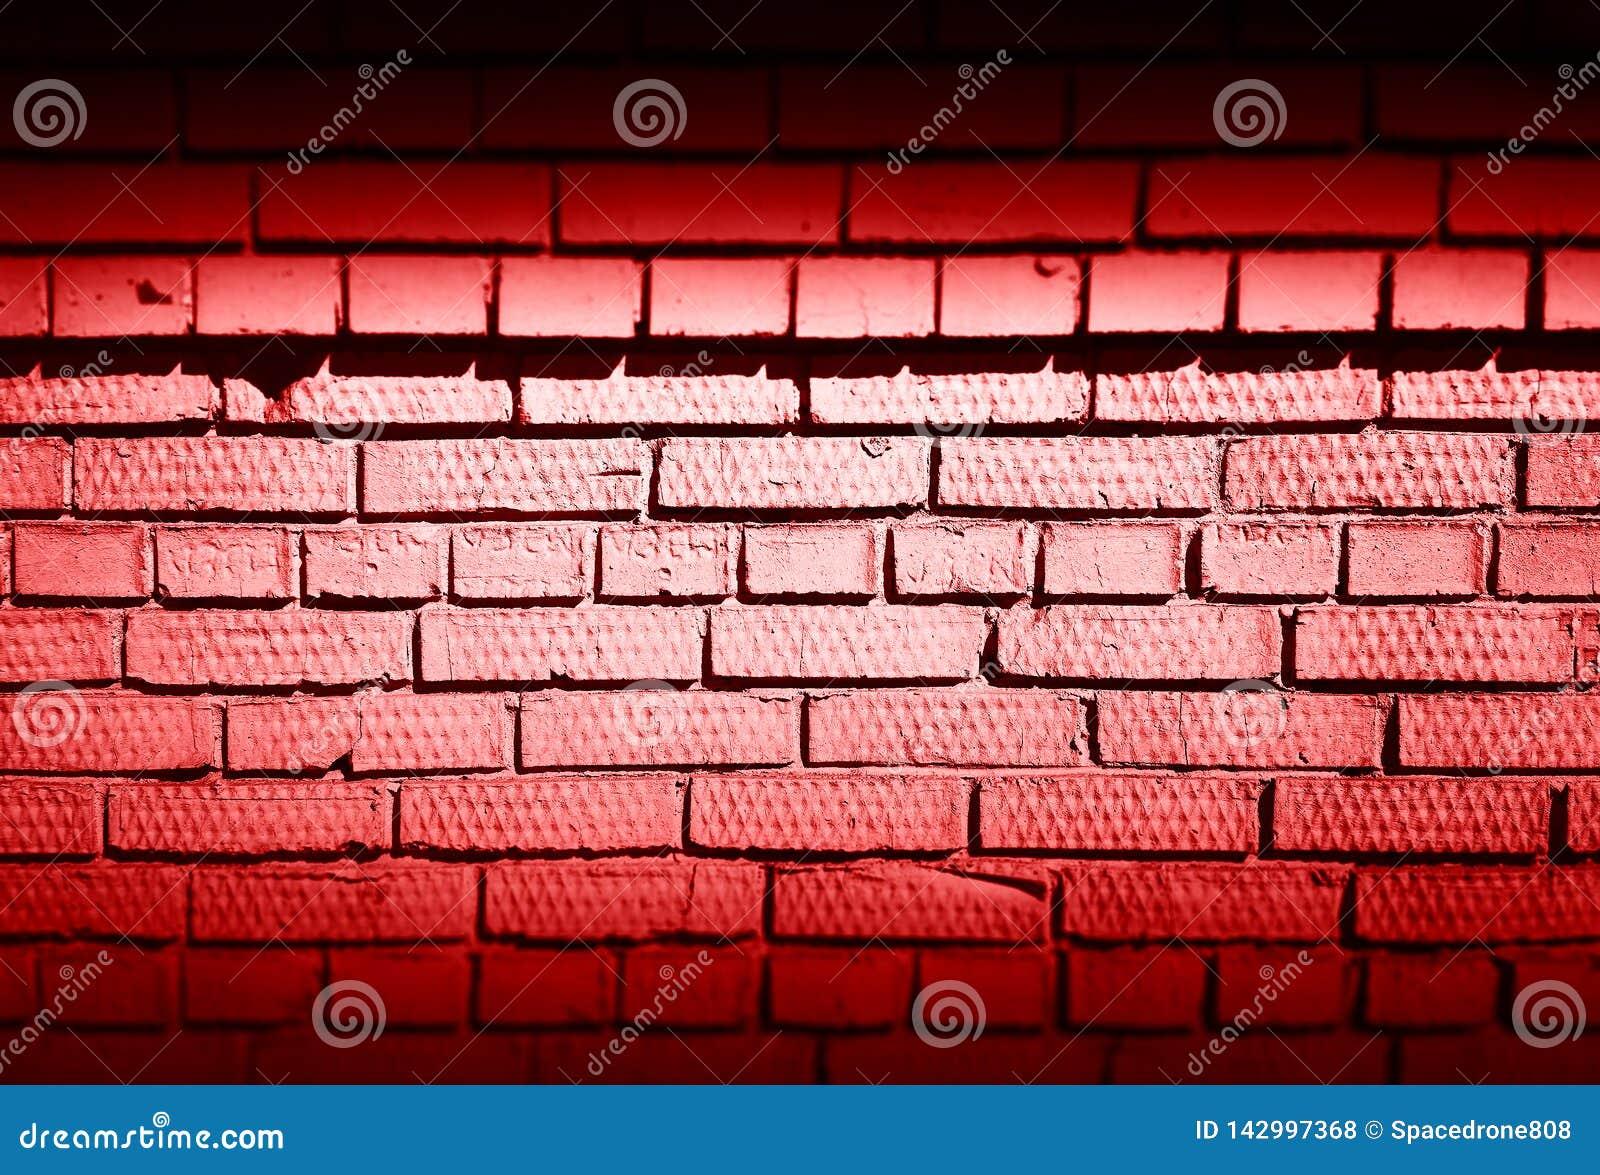 Horizontal Red Dark Brick Wall Texture Background Stock